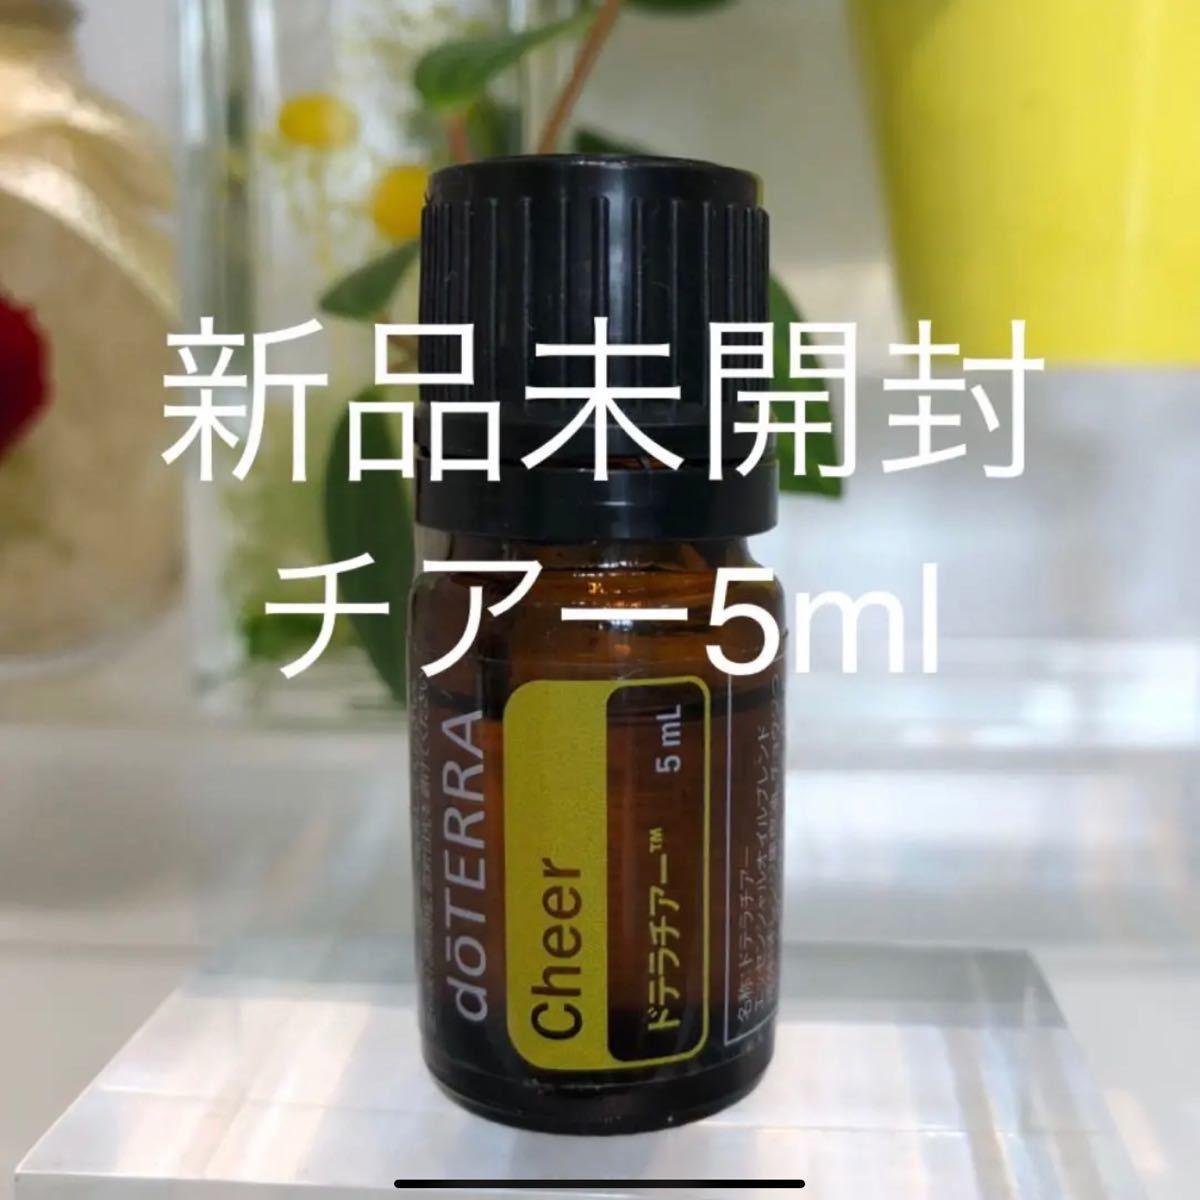 ★SALE★ドテラ チアー5ml ★正規品★新品未開封★